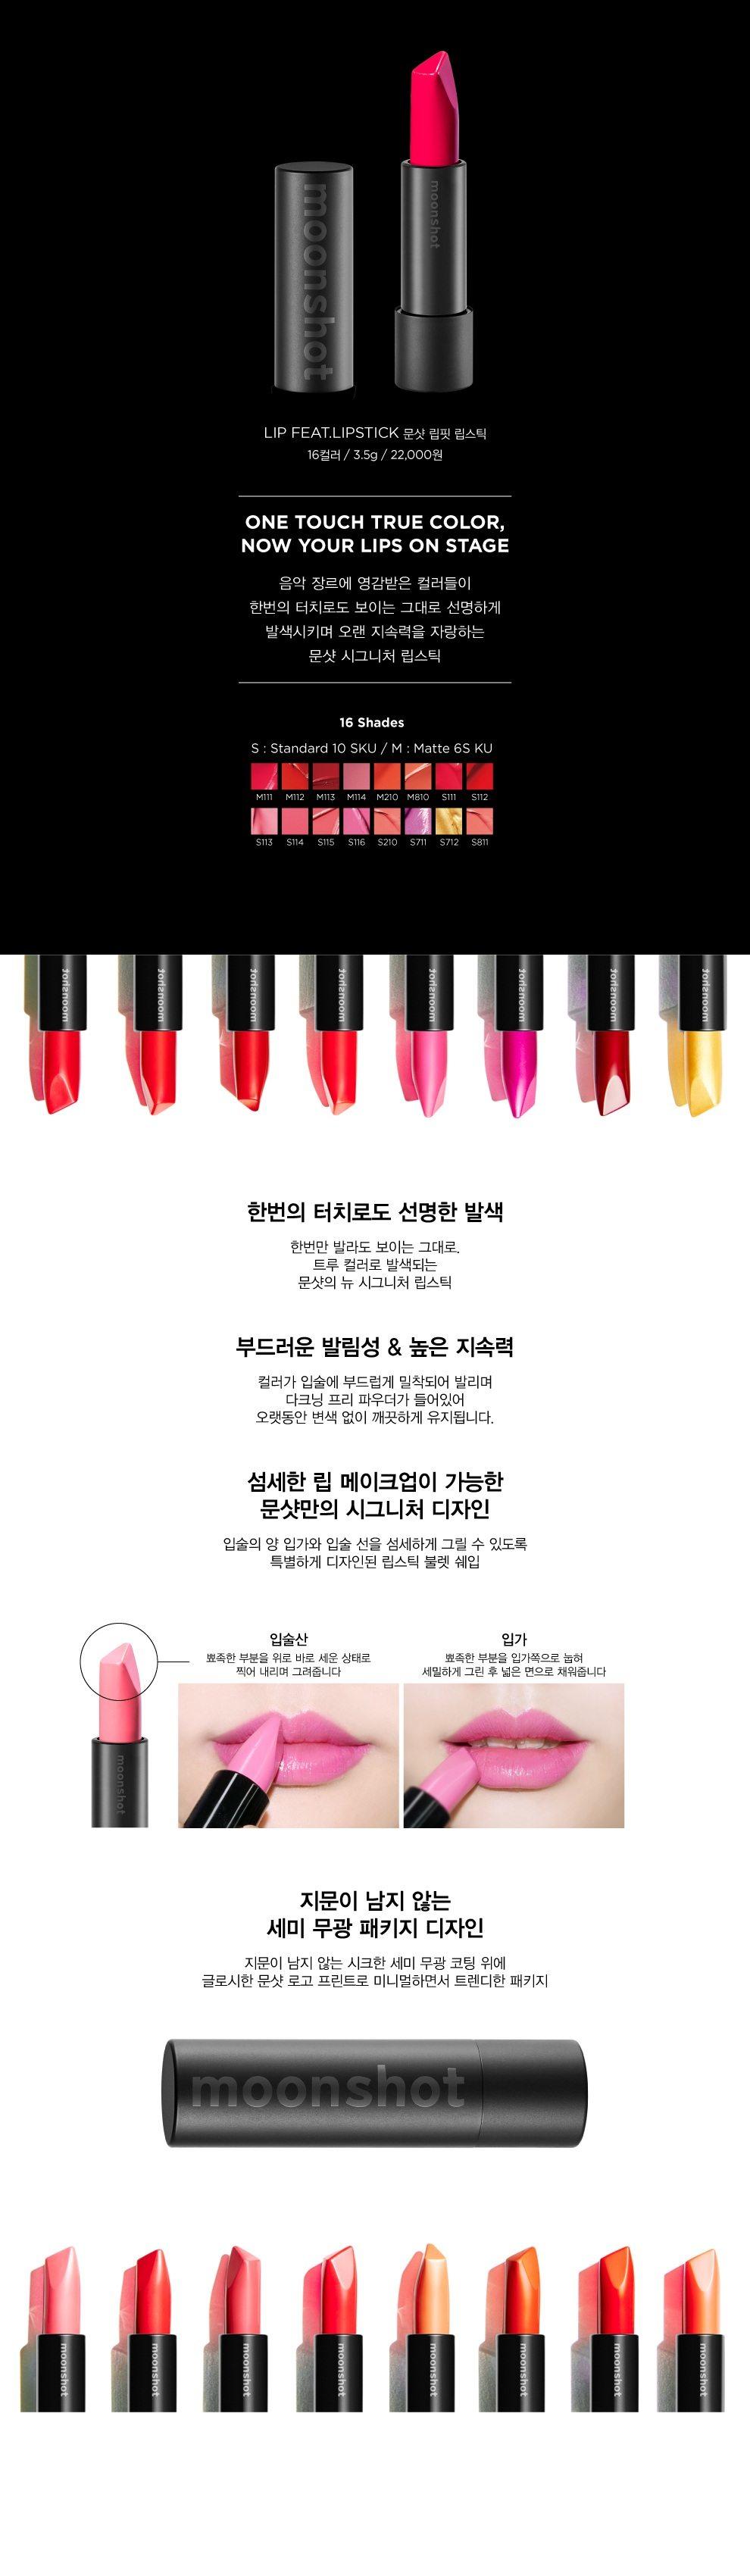 Moonshot Lip Feat Lipstick korean cosmetic makeup product online shop malaysia uk taiwan2